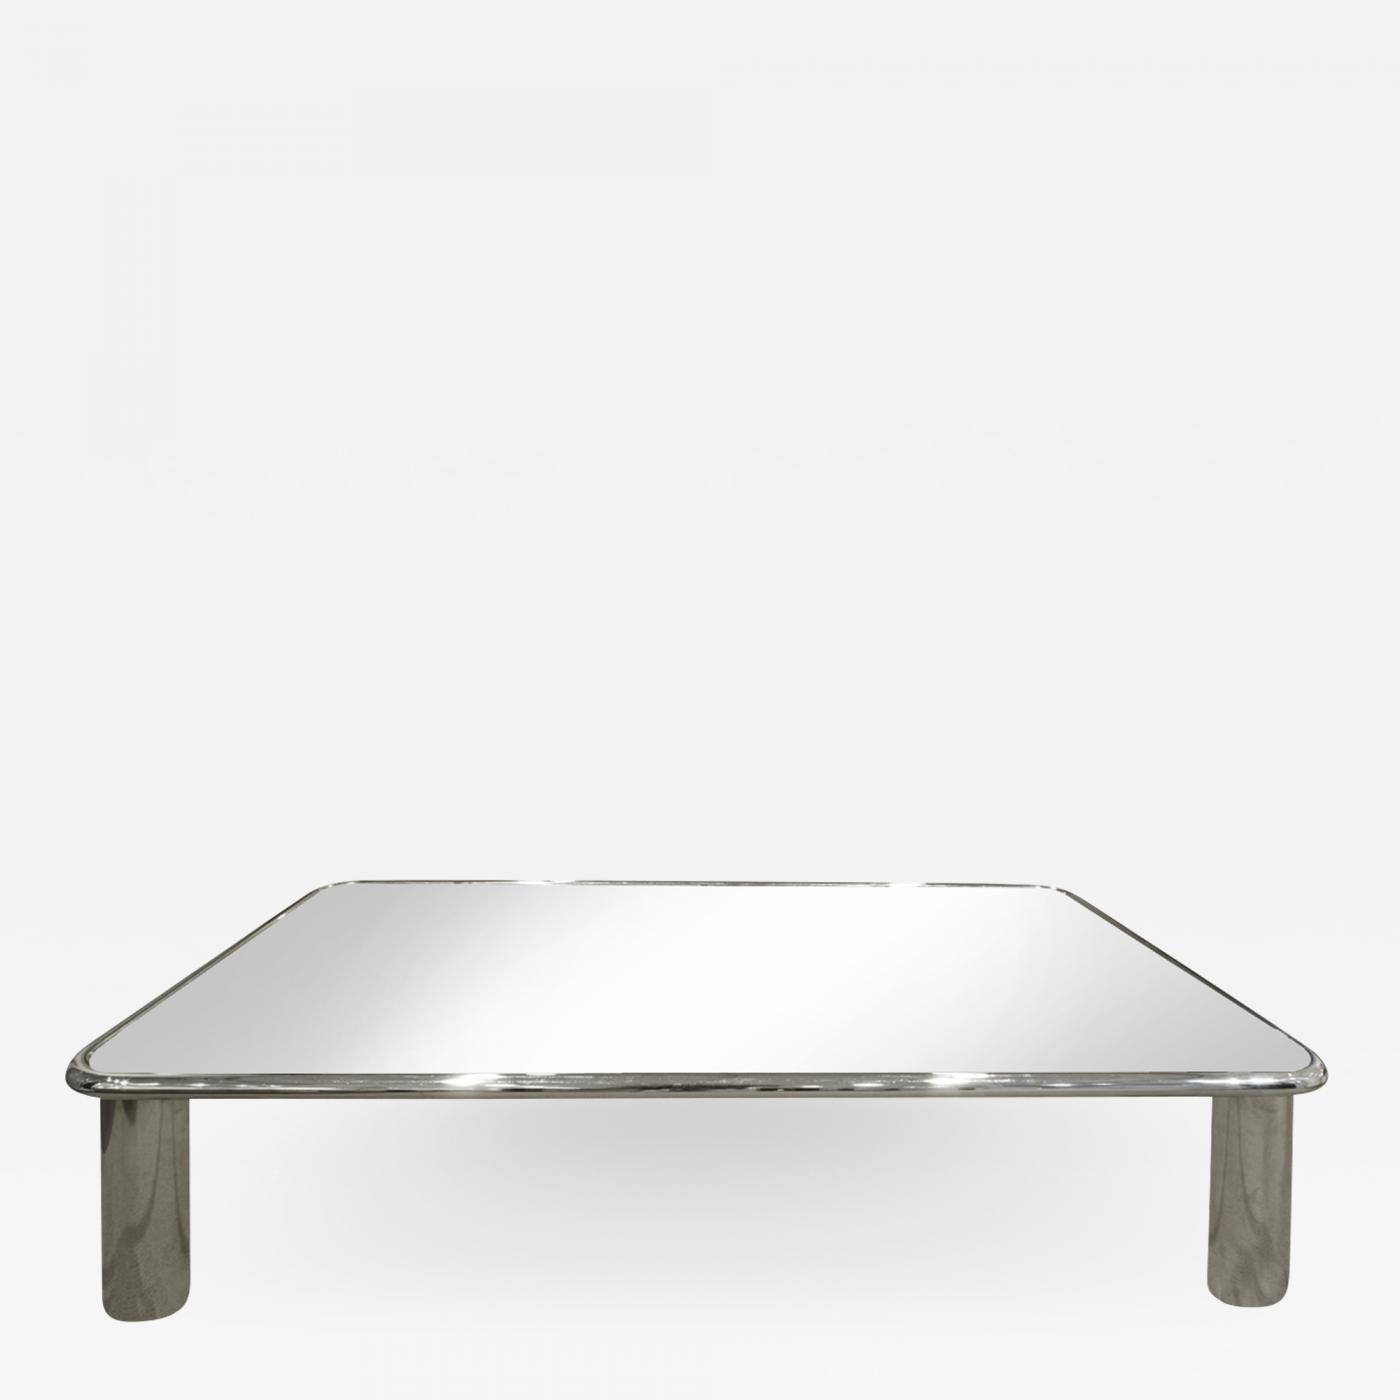 john mascheroni john mascheroni large chrome coffee table with mirror glass top 1970s